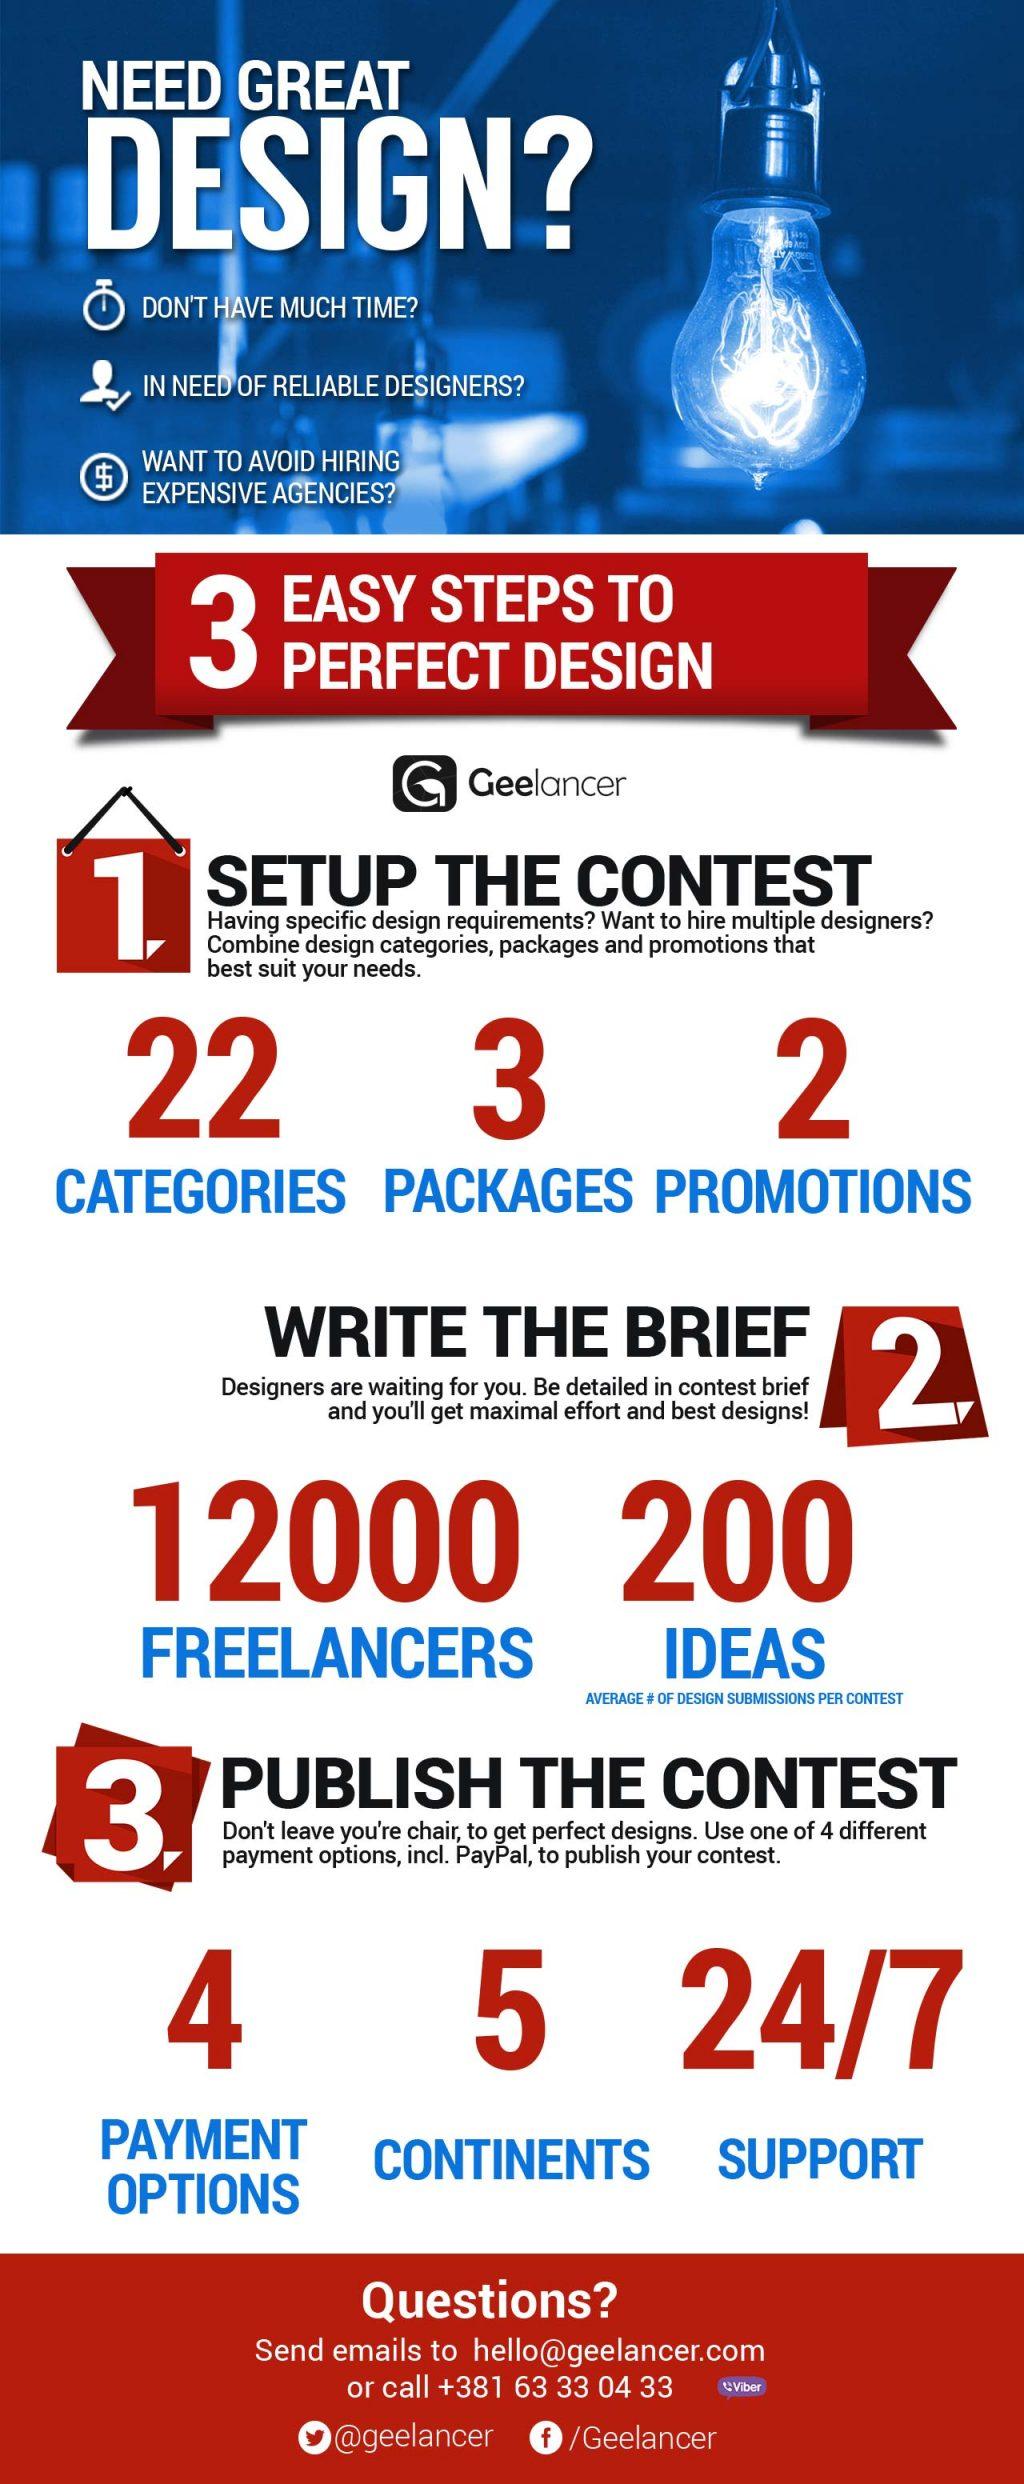 Geelancer online design contest and design jobs